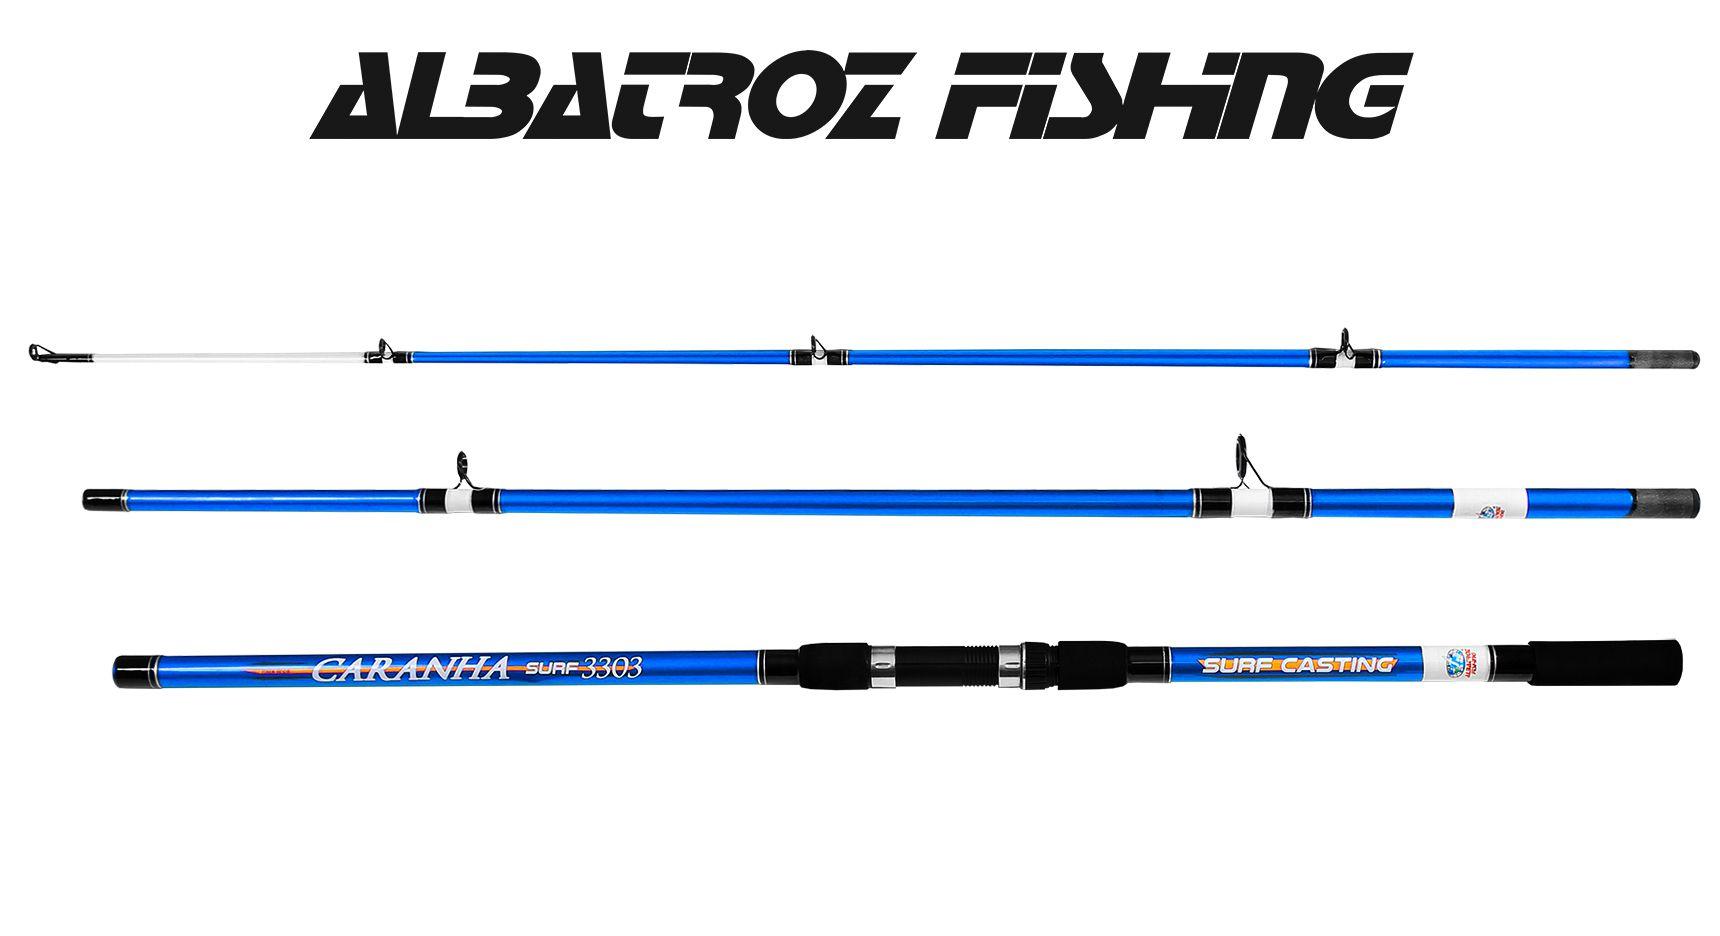 Vara Para Molinete Albatroz Fishing Caranha Surf 4503 (4,50m) 40-60Lbs 3 Partes